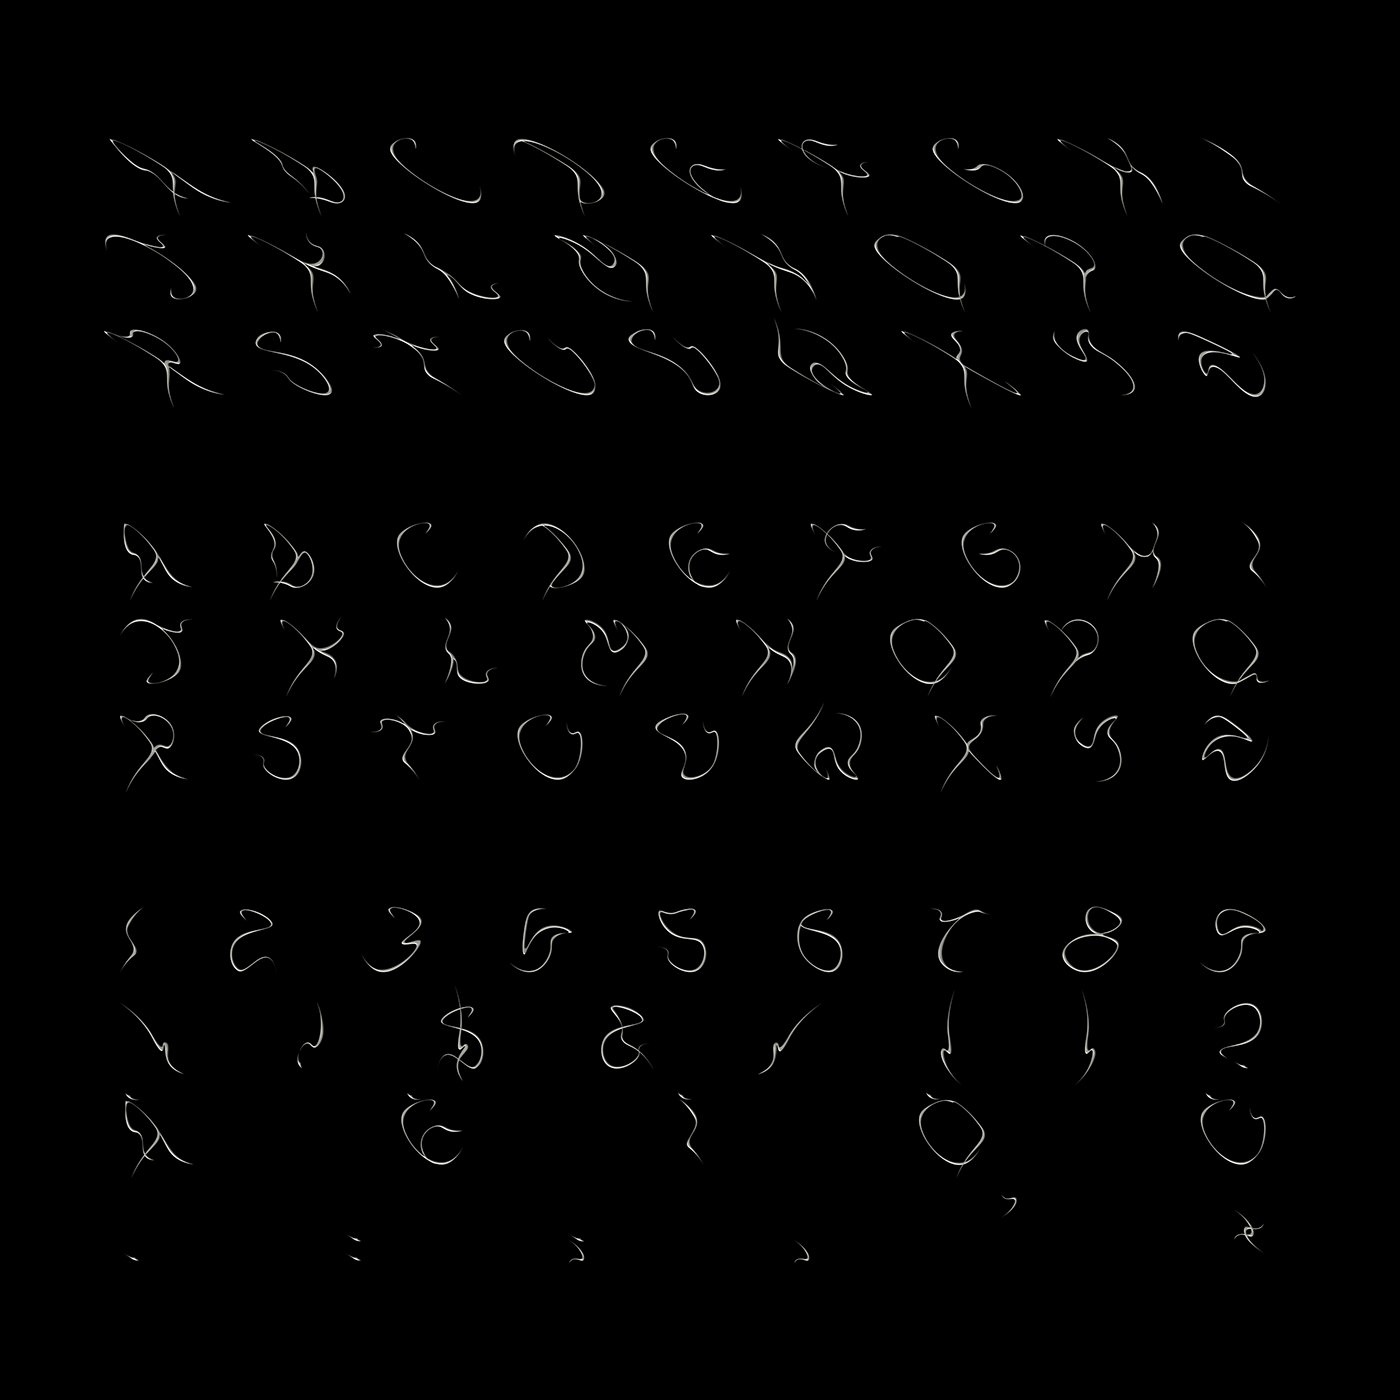 custom type custom font font Typeface elegant tribal cursive abstract digital